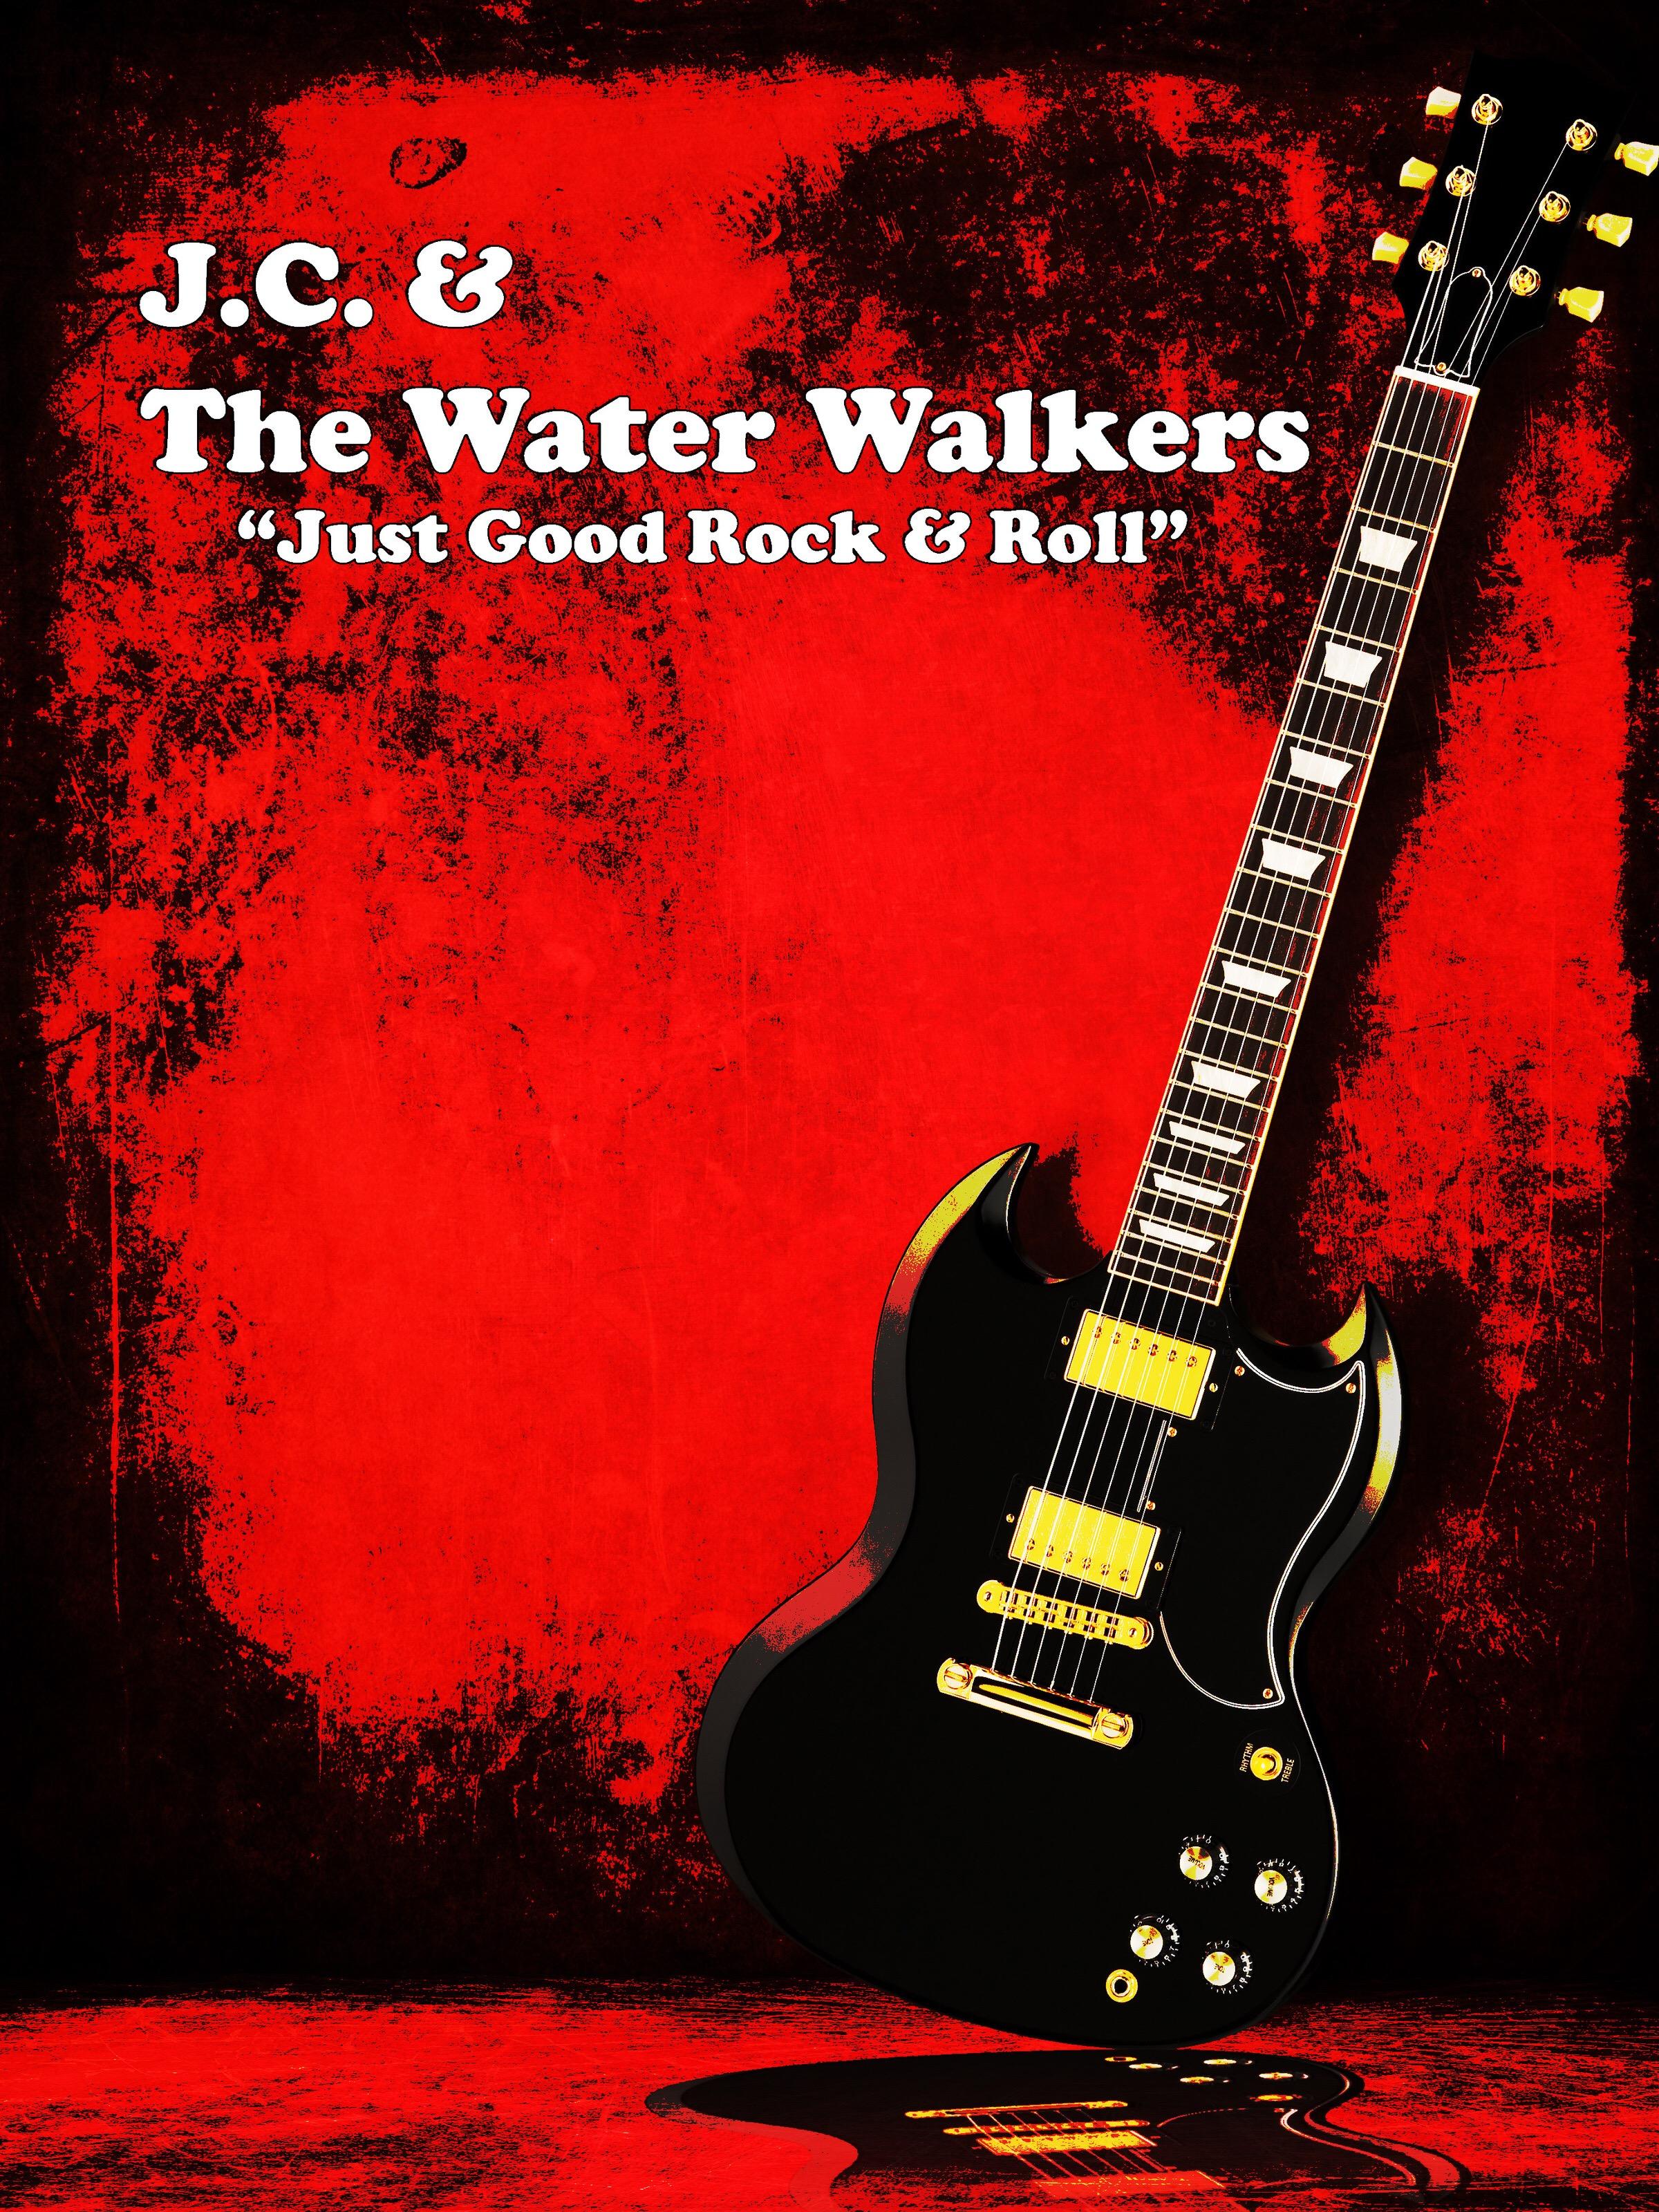 J.C. & The Water Walkers